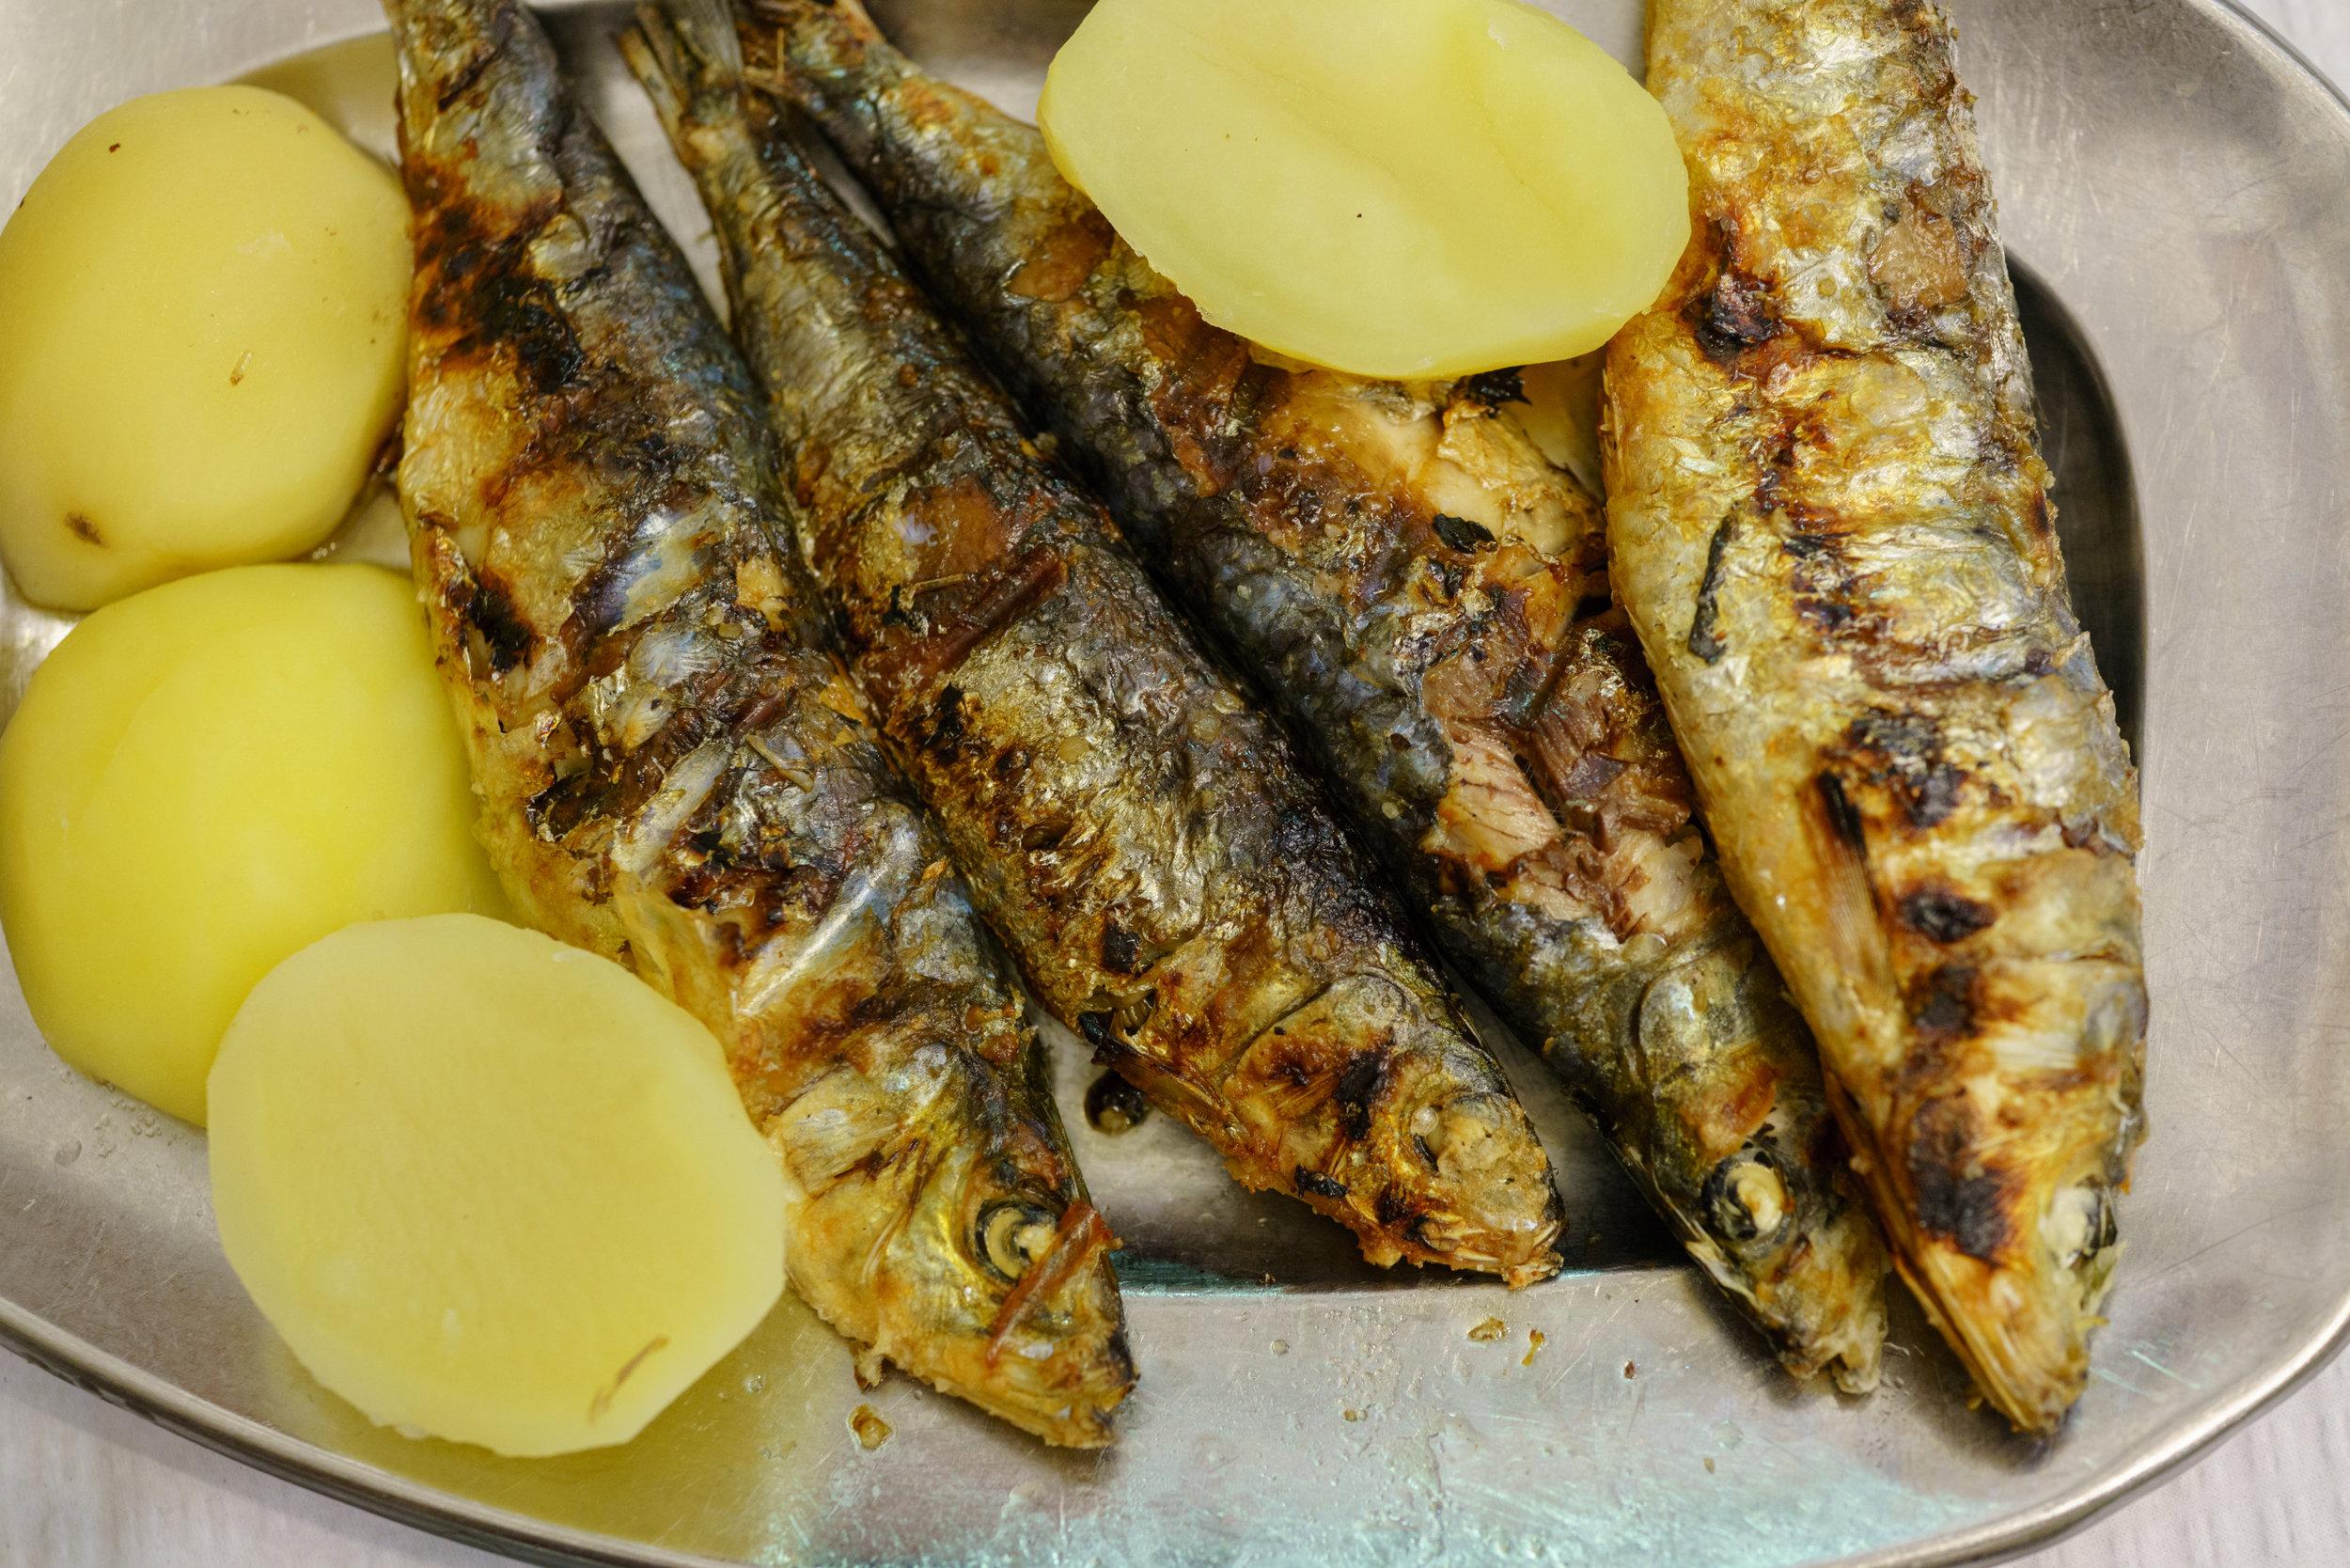 Grilled Sardines at Restaurante A Merendinha do Arco